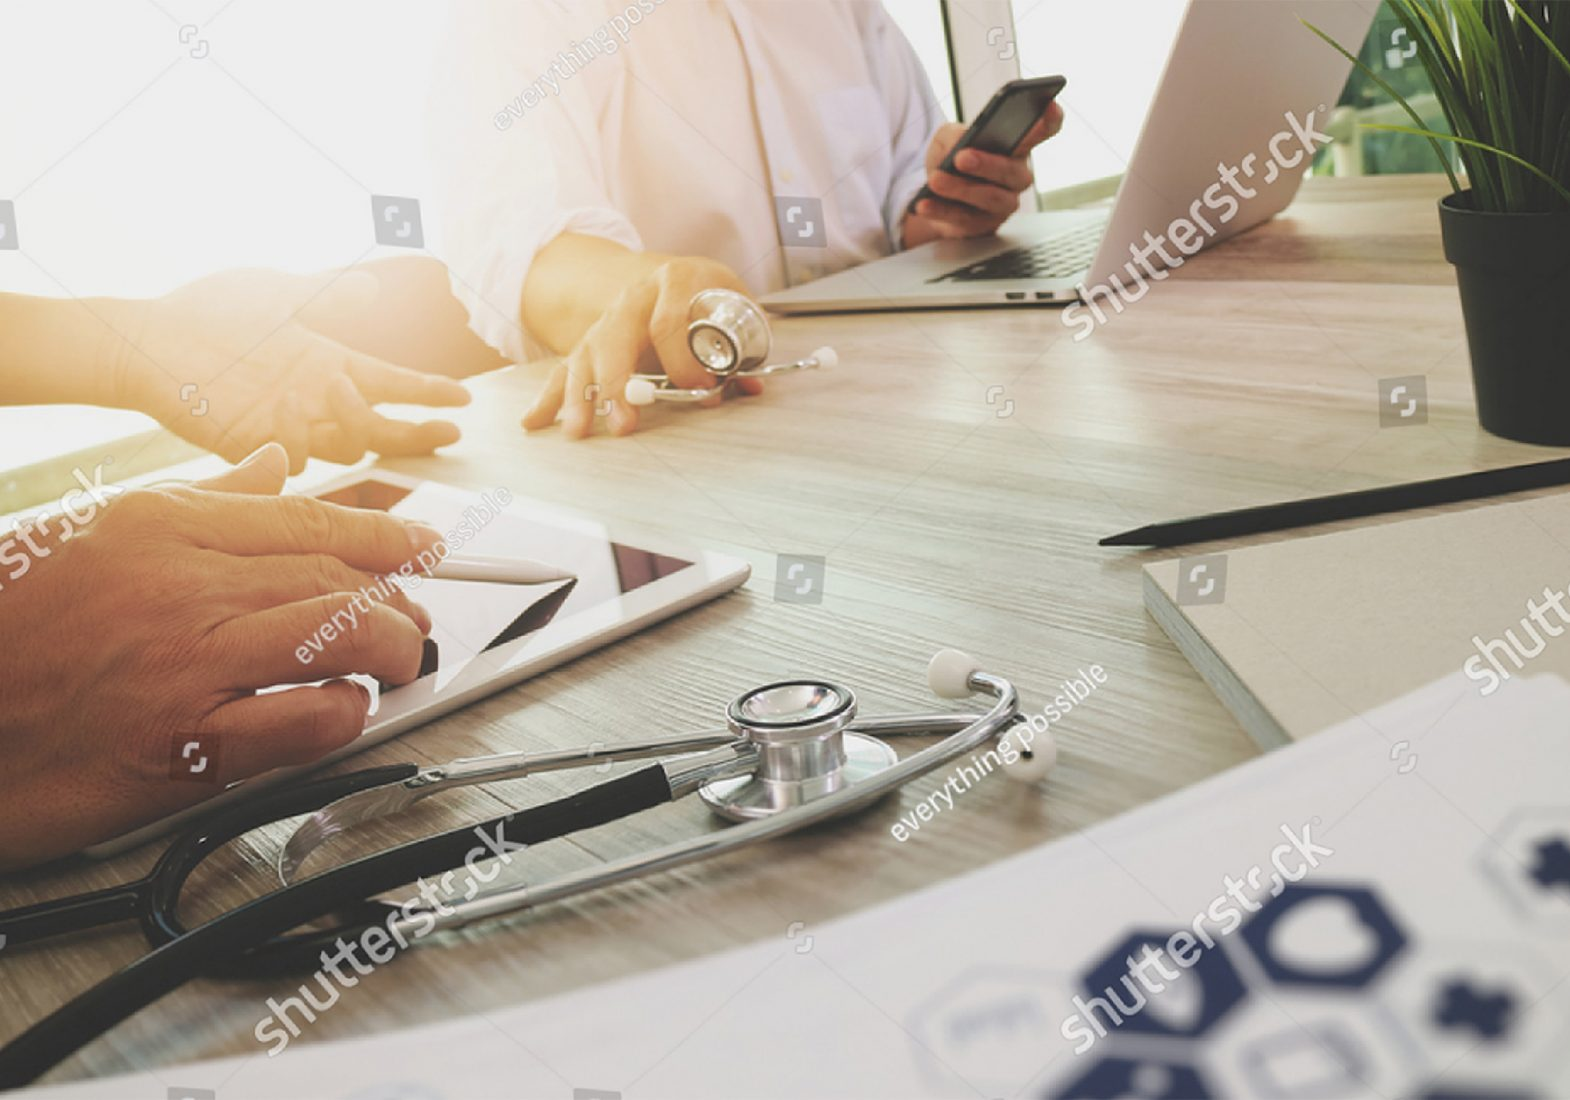 Championing interoperability and revolutionising digital healthcare across the UK